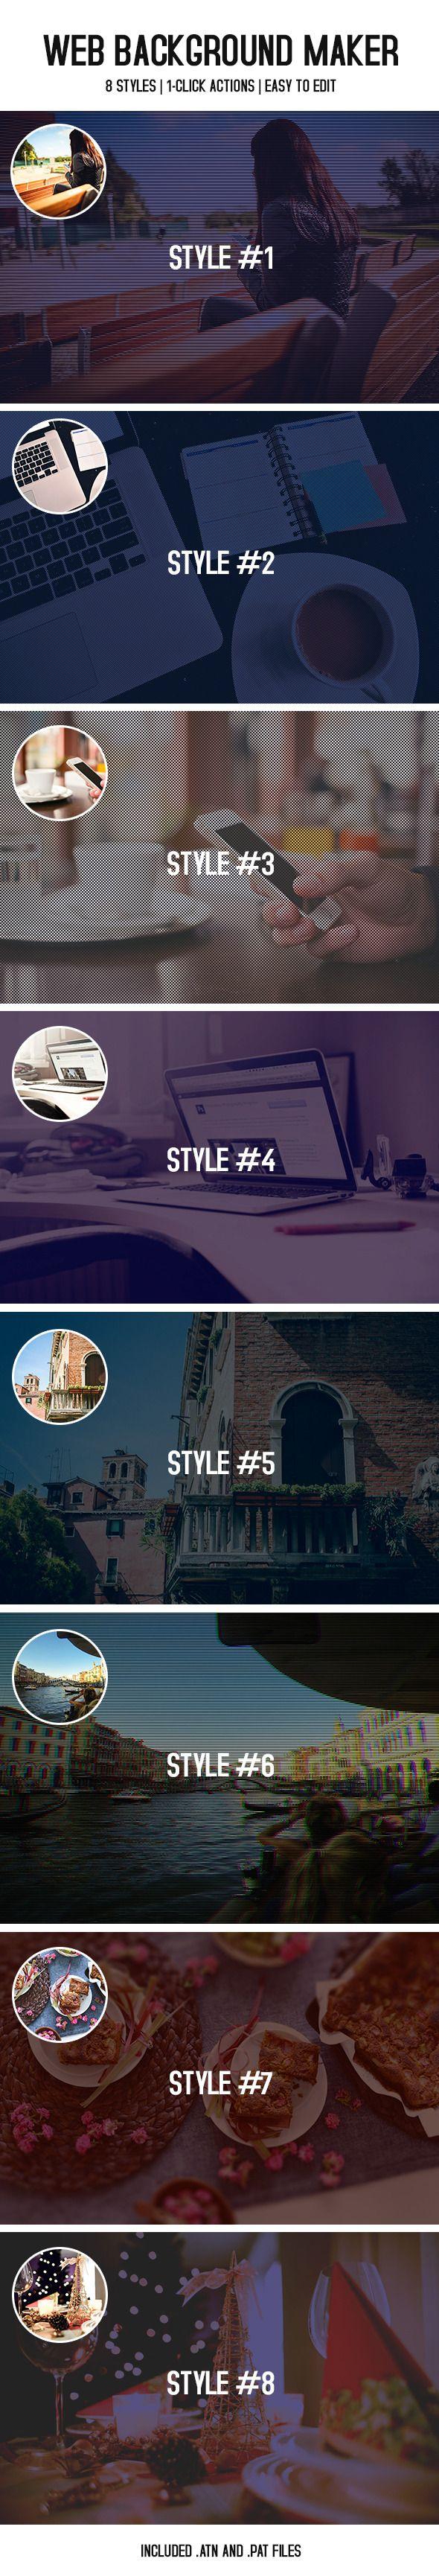 Web Background Maker #photoeffects #actions Download: http://graphicriver.net/item/web-background-maker/9672401?ref=ksioks